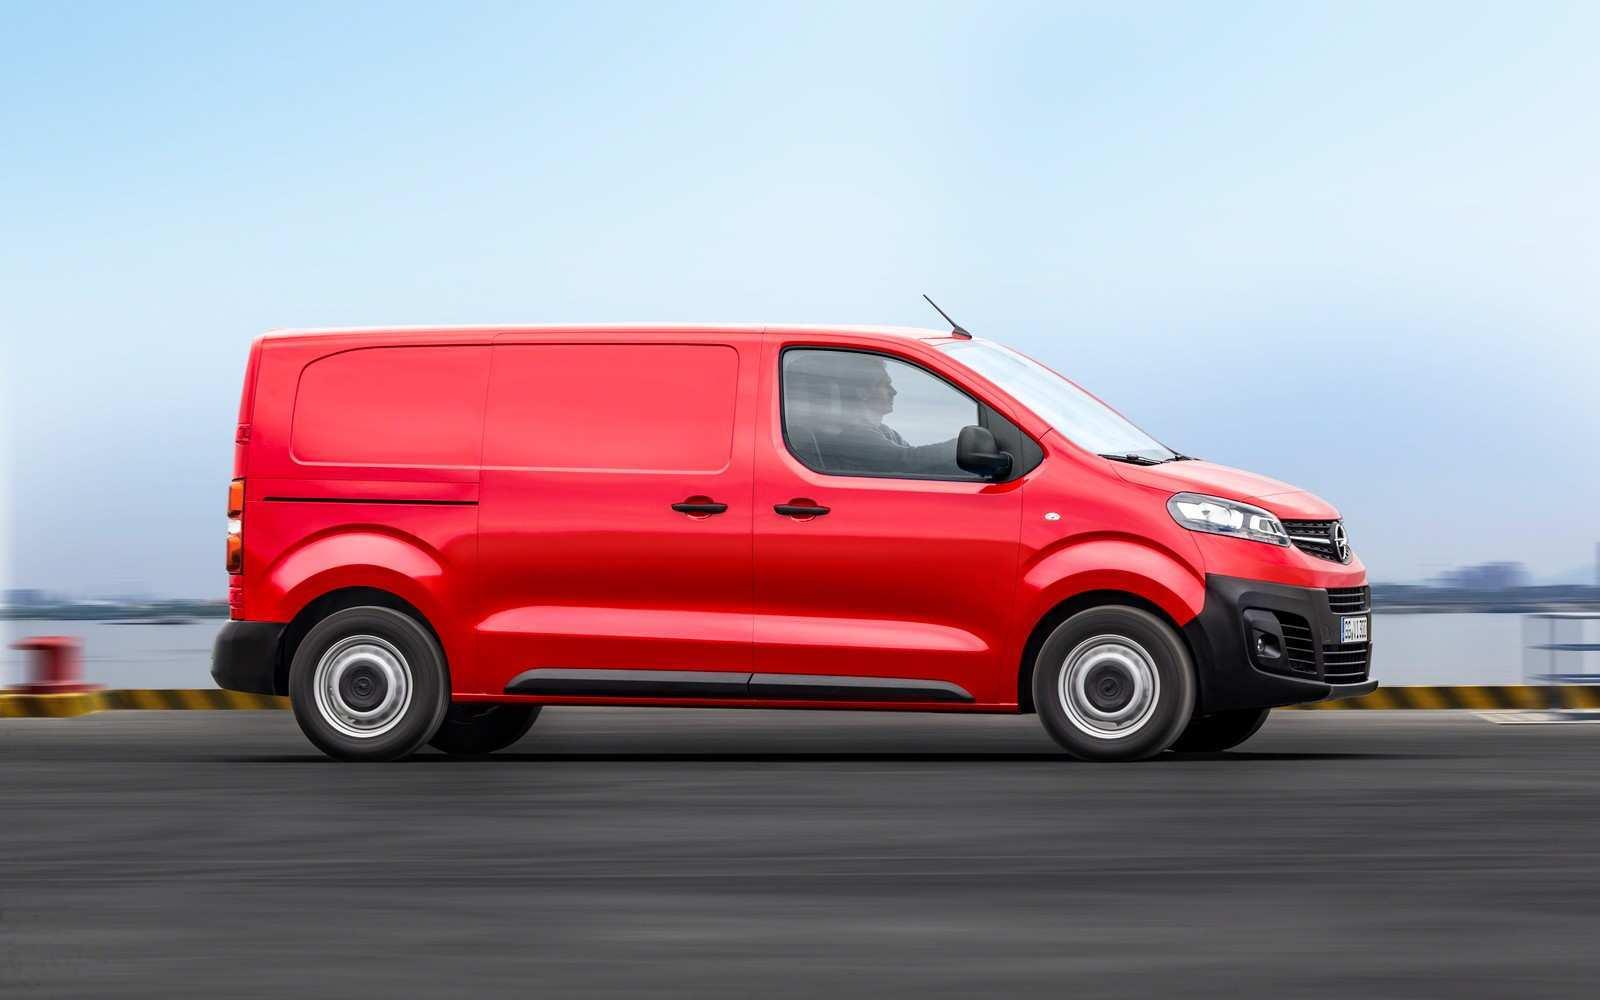 45 New Neuer Opel Vivaro 2020 Pricing with Neuer Opel Vivaro 2020